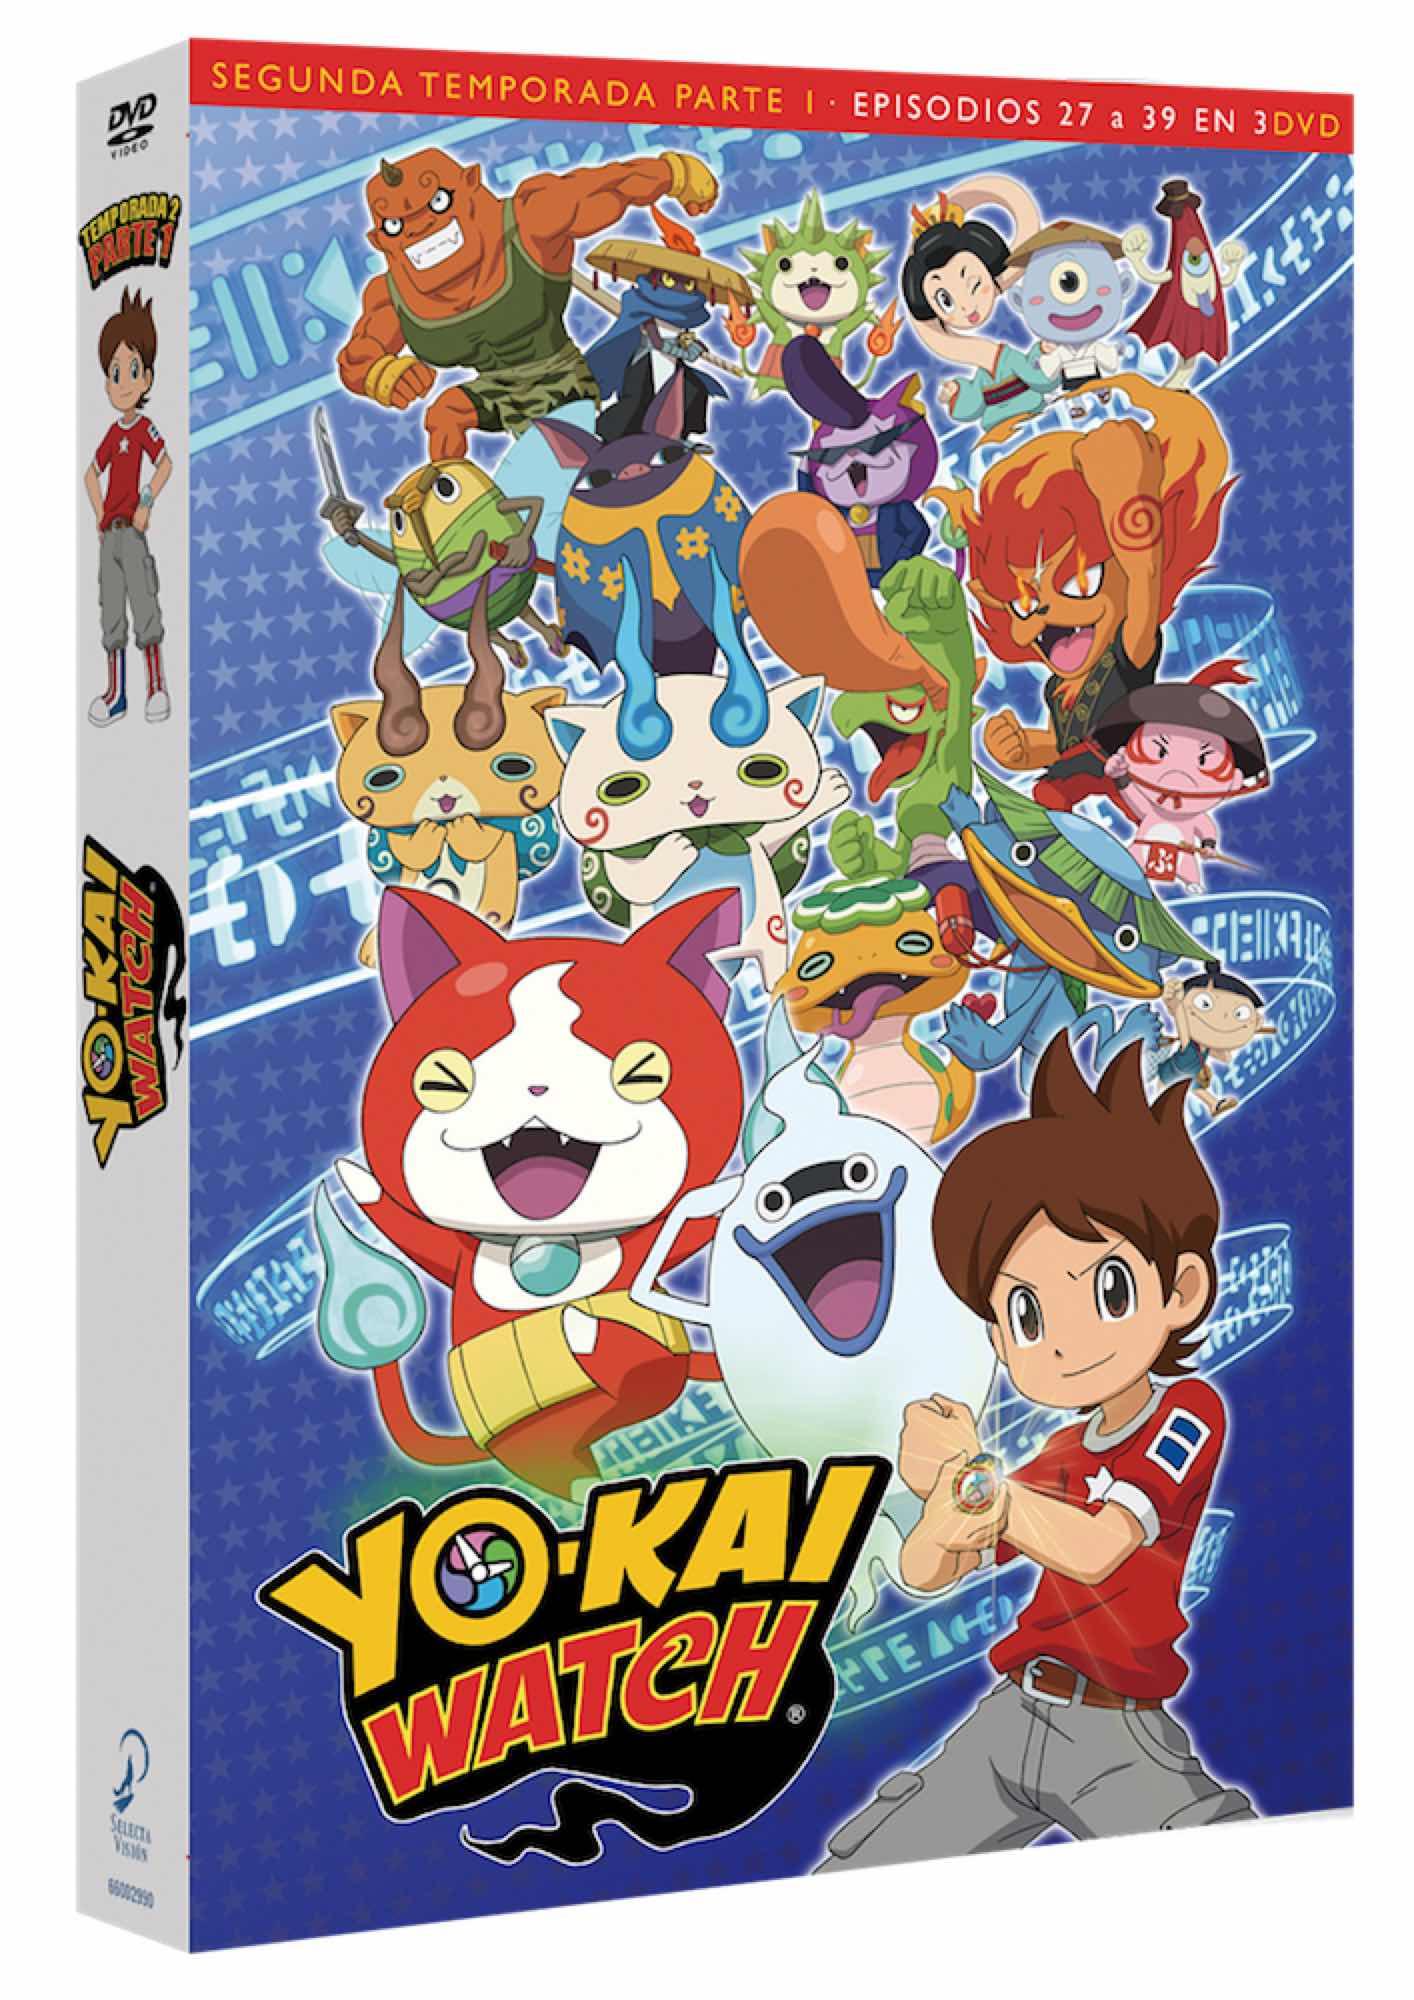 DVD YOKAI WATCH TEMP 2 PARTE 1